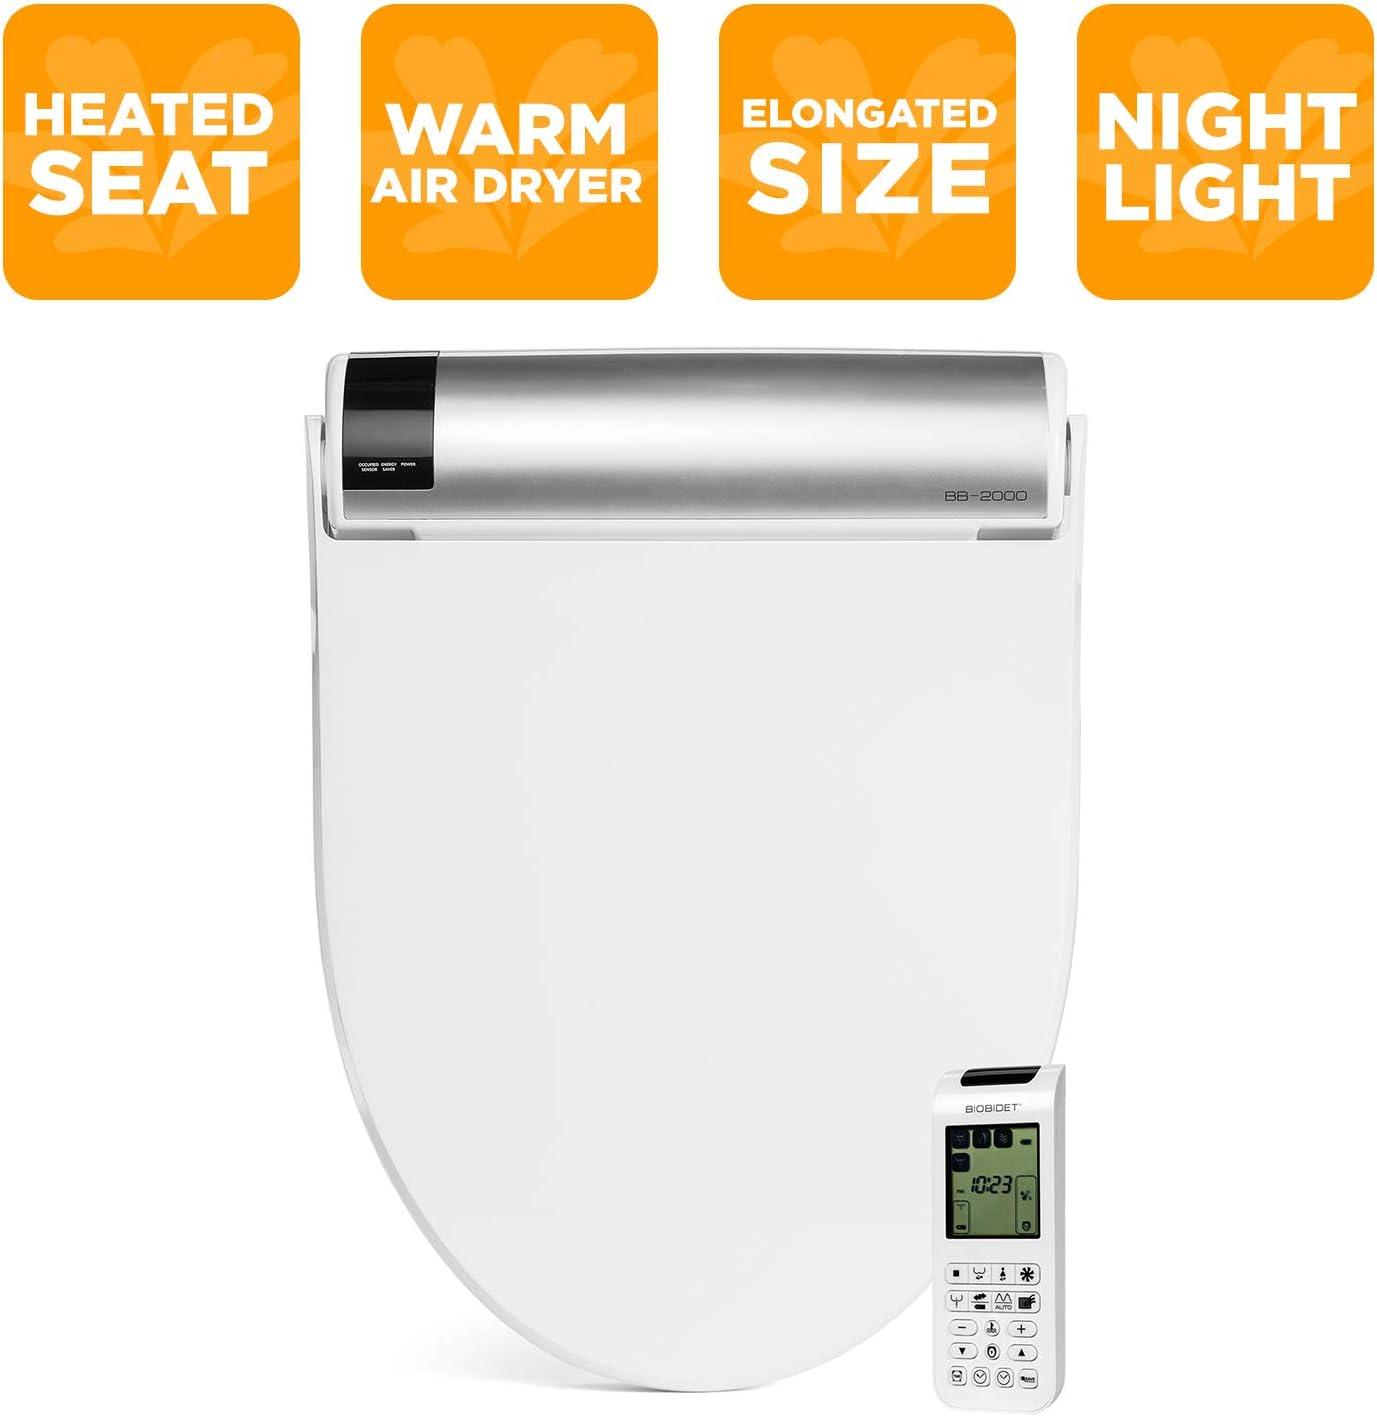 Bio Bidet Bliss Bb2000 Elongated White Smart Toilet Seat Premier Class Unlimited Warm Water Vortex Wash Amazon Com